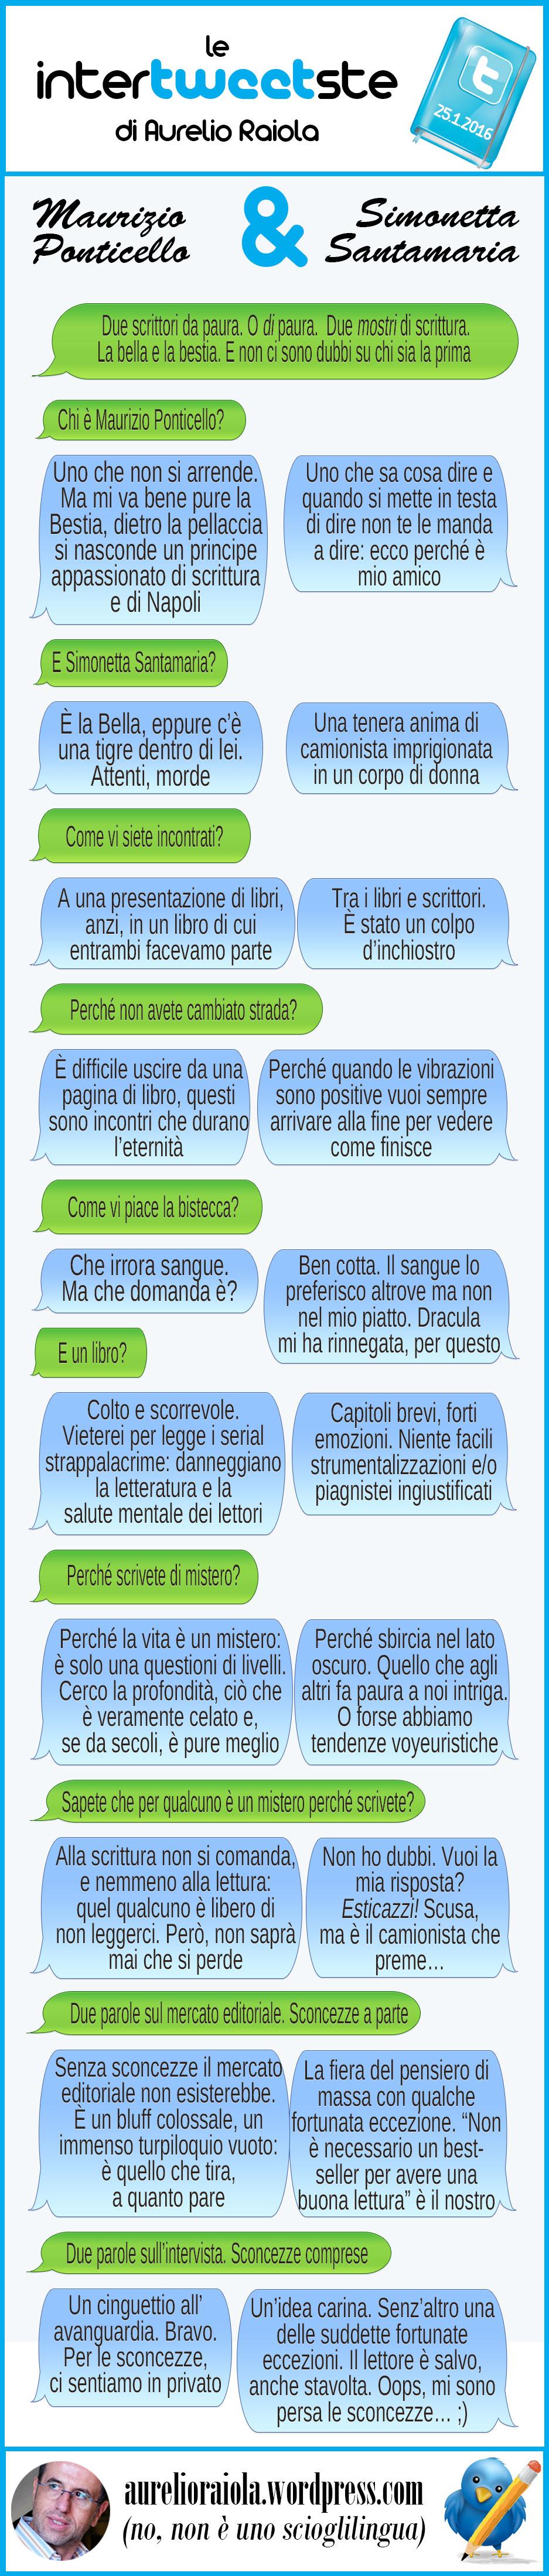 Intertweetste-Maurizio-Ponticello-e-Simonetta-Santamaria_forweb